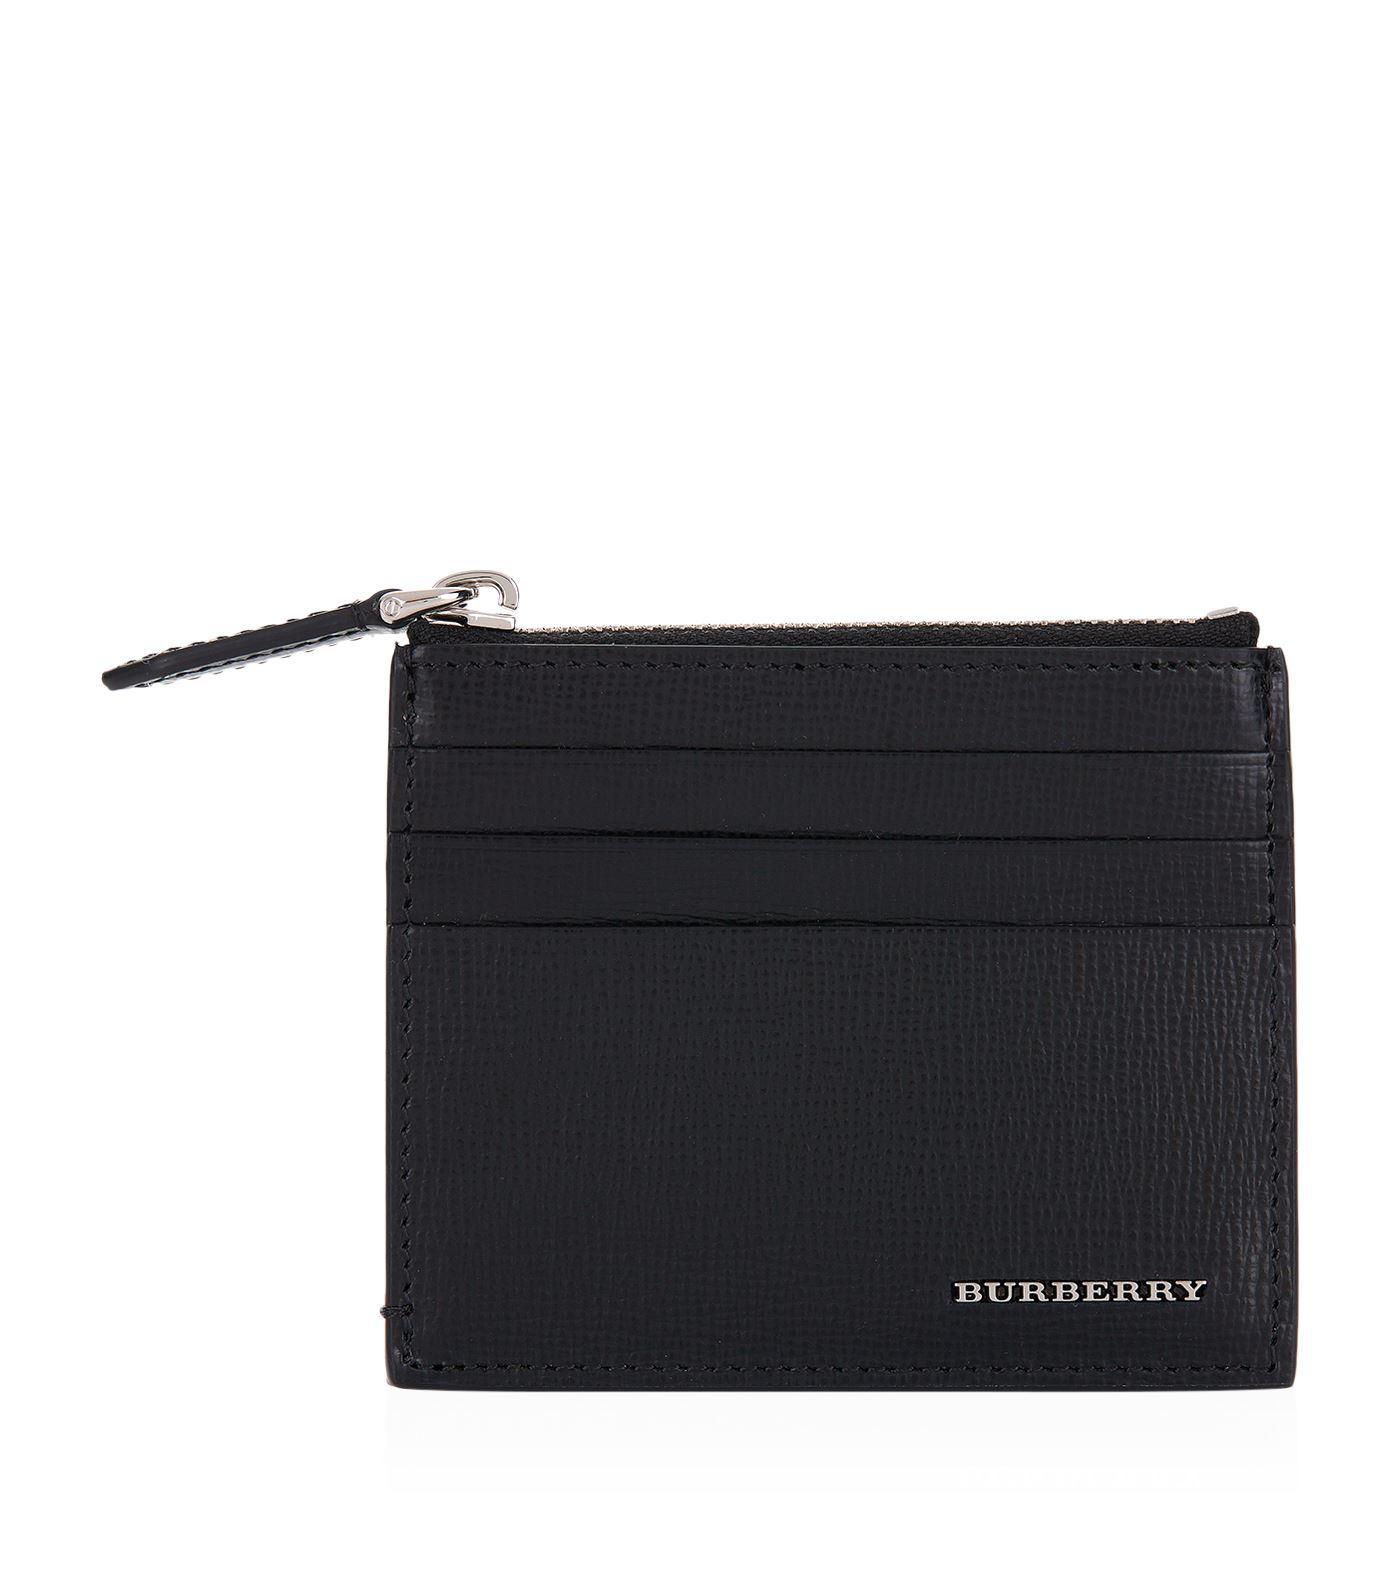 hot sale online b39b2 6c872 Burberry Black Zip Pocket Card Holder